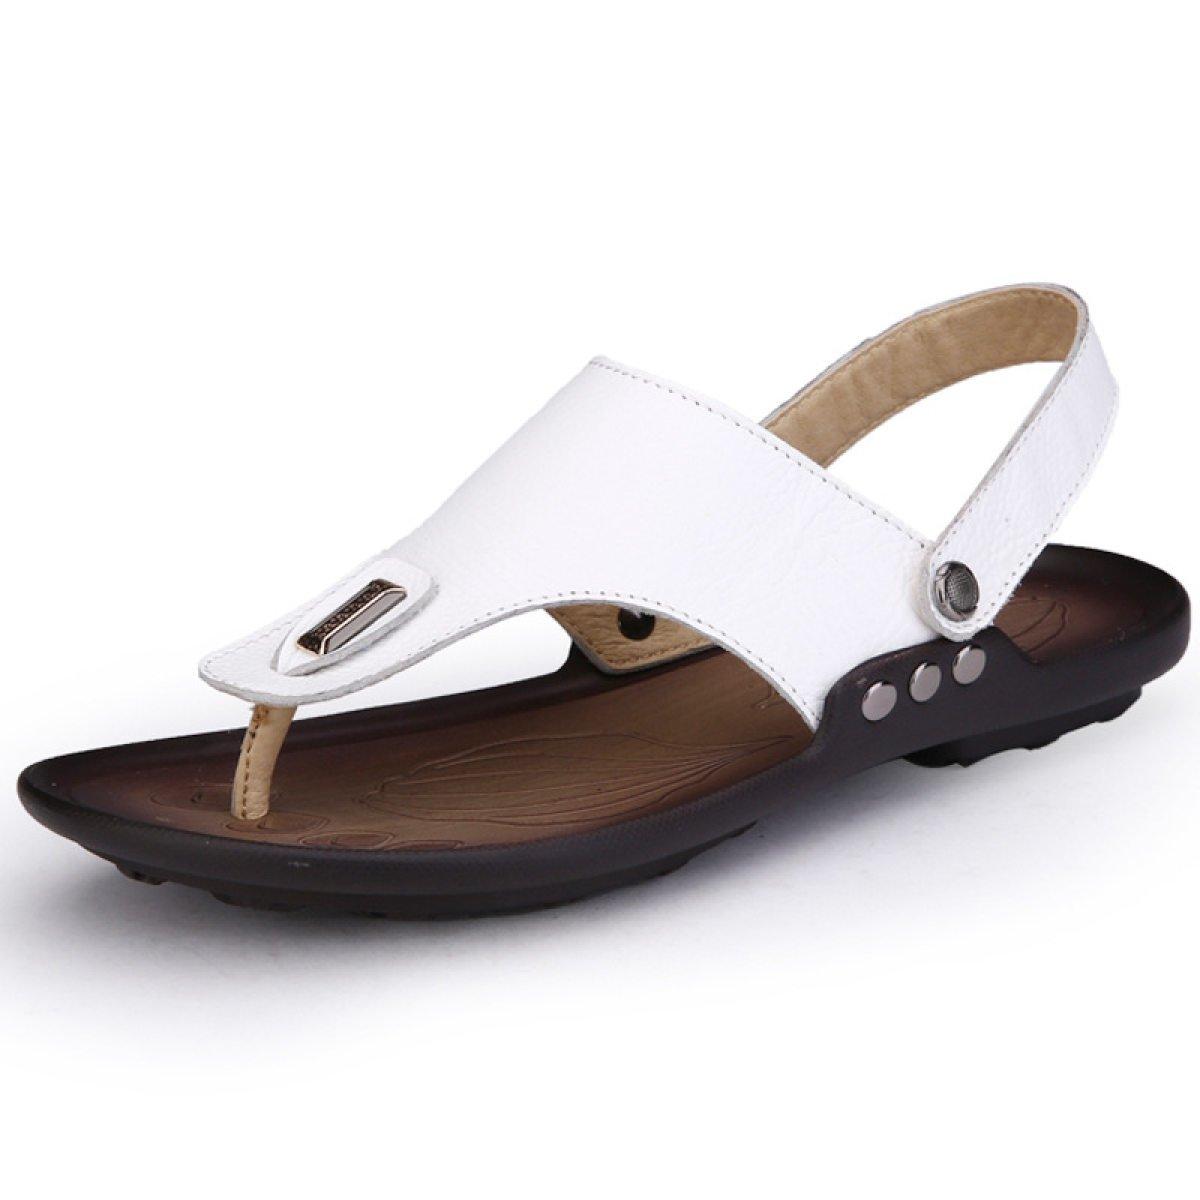 LXXAMens Verano Playa Flip Flops Cuero Real Thong Sandalias Sandalias Zapatos De Trekking,White-41EU 41EU|White